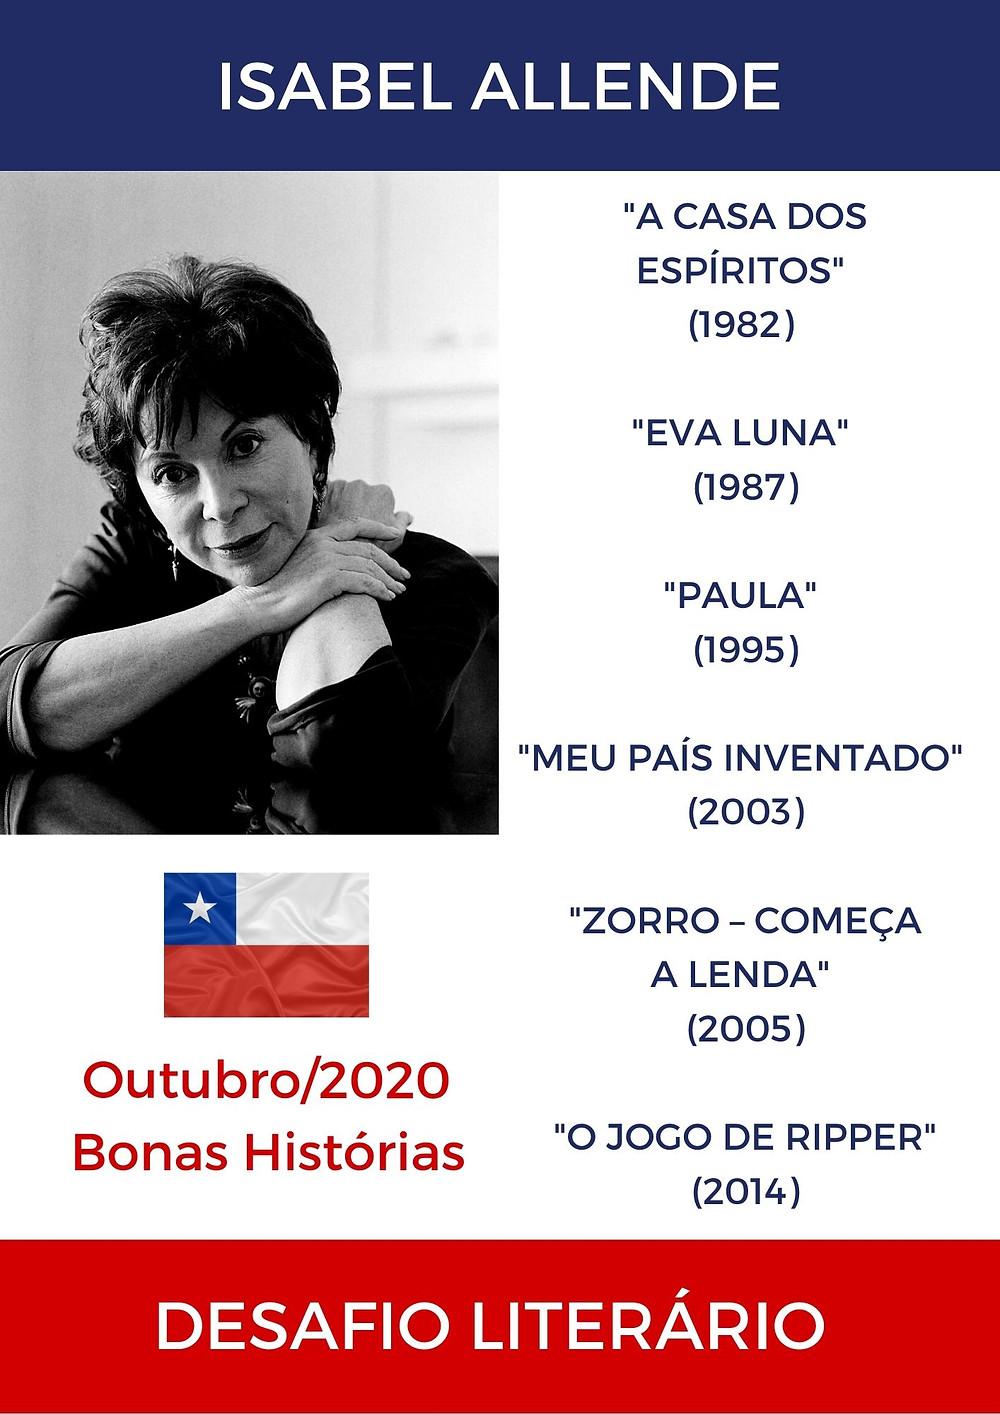 Análise Literária de Isabel Allende